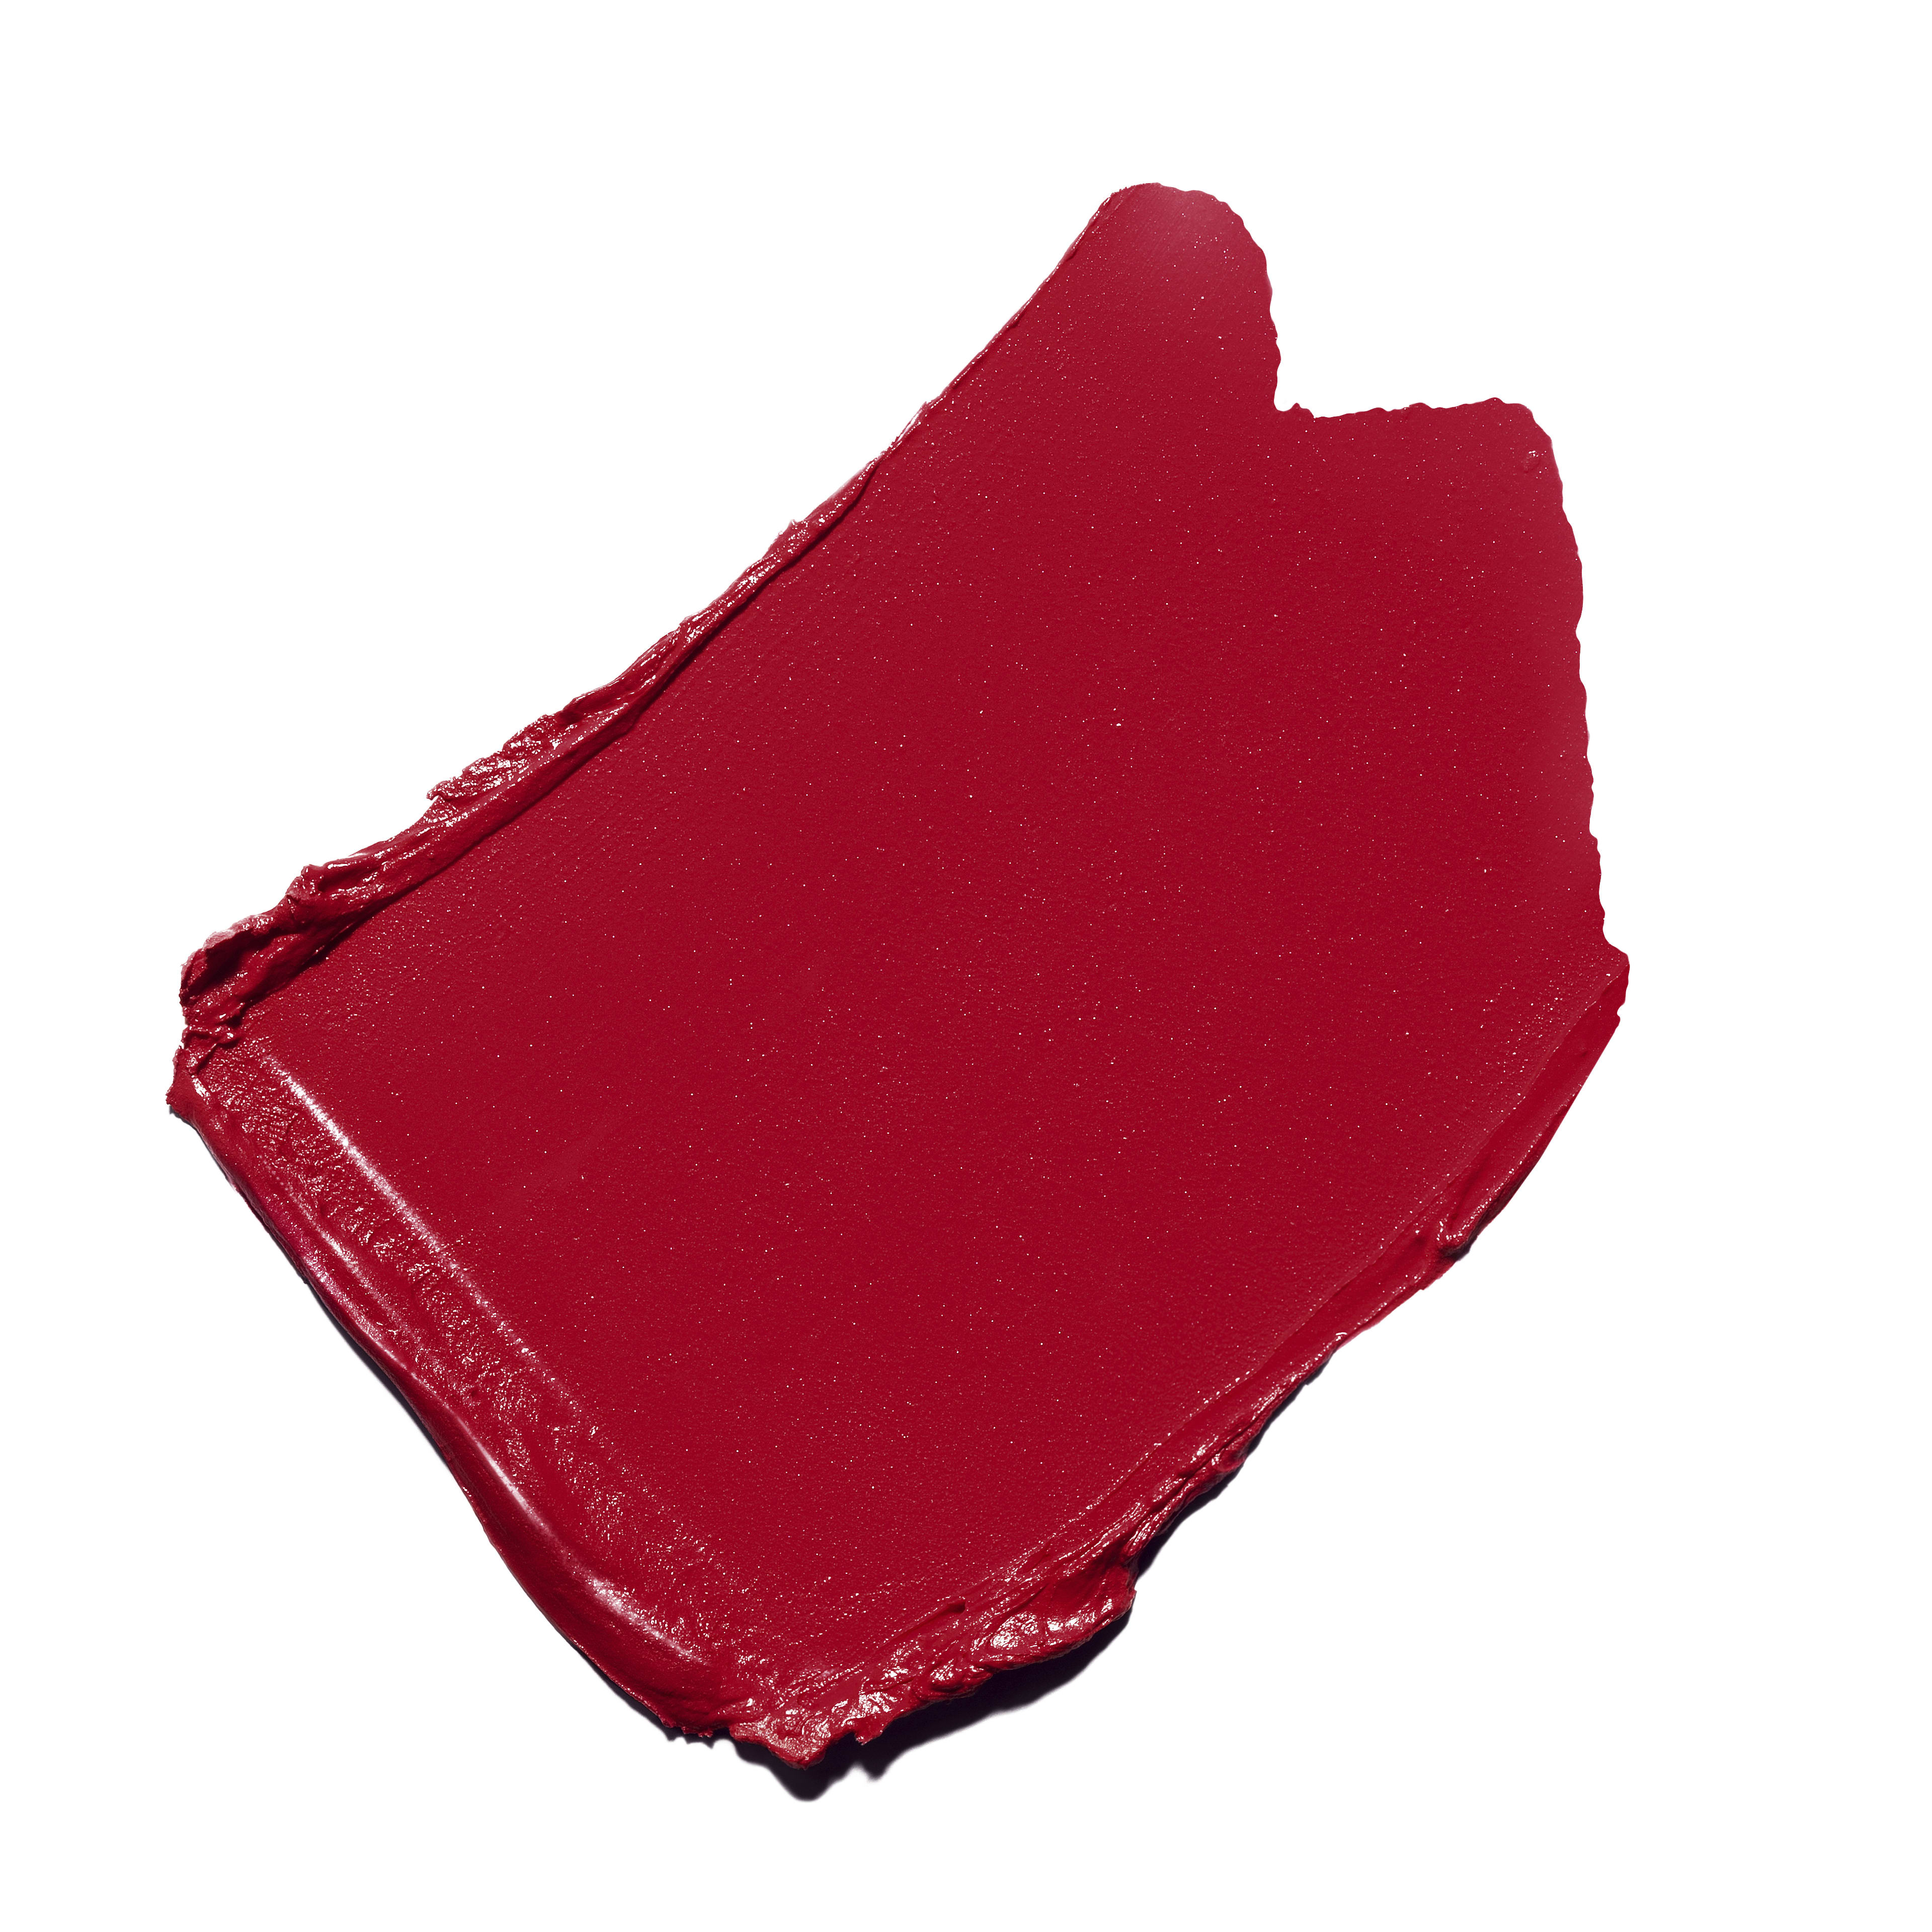 ROUGE ALLURE - makeup - 0.12OZ. - Basic texture view